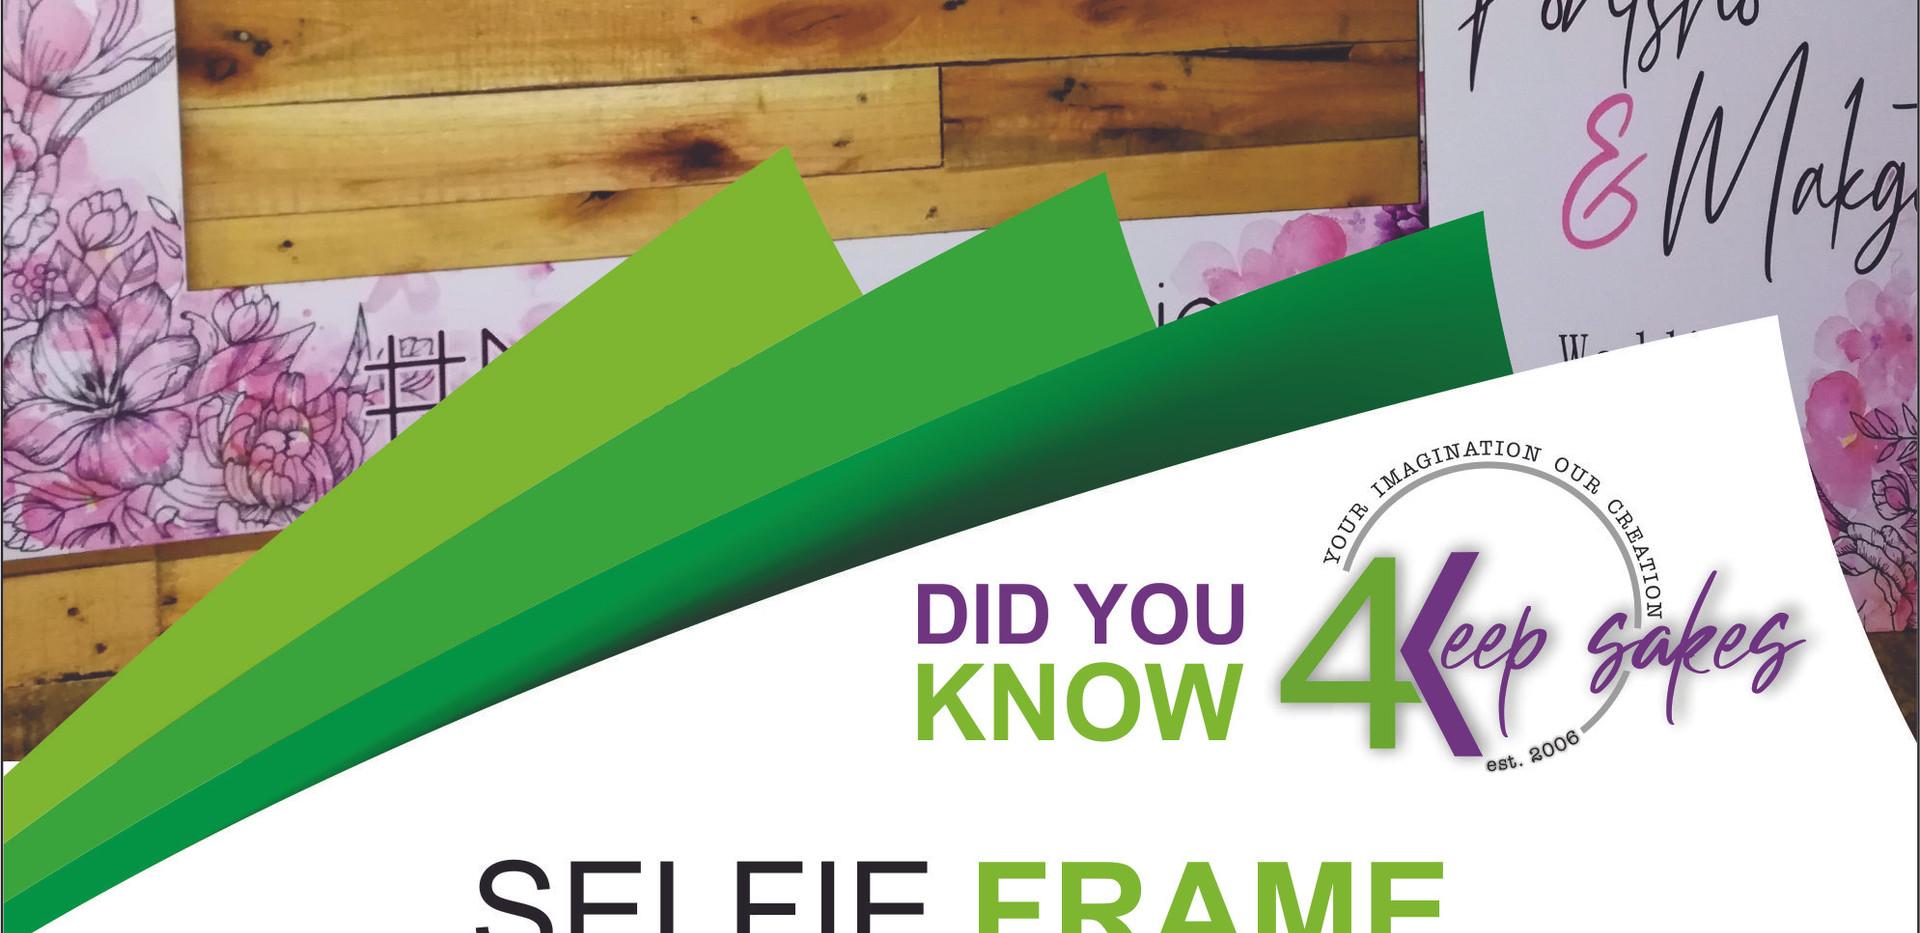 Did you know 4keepsake Slefie Frame.jpg